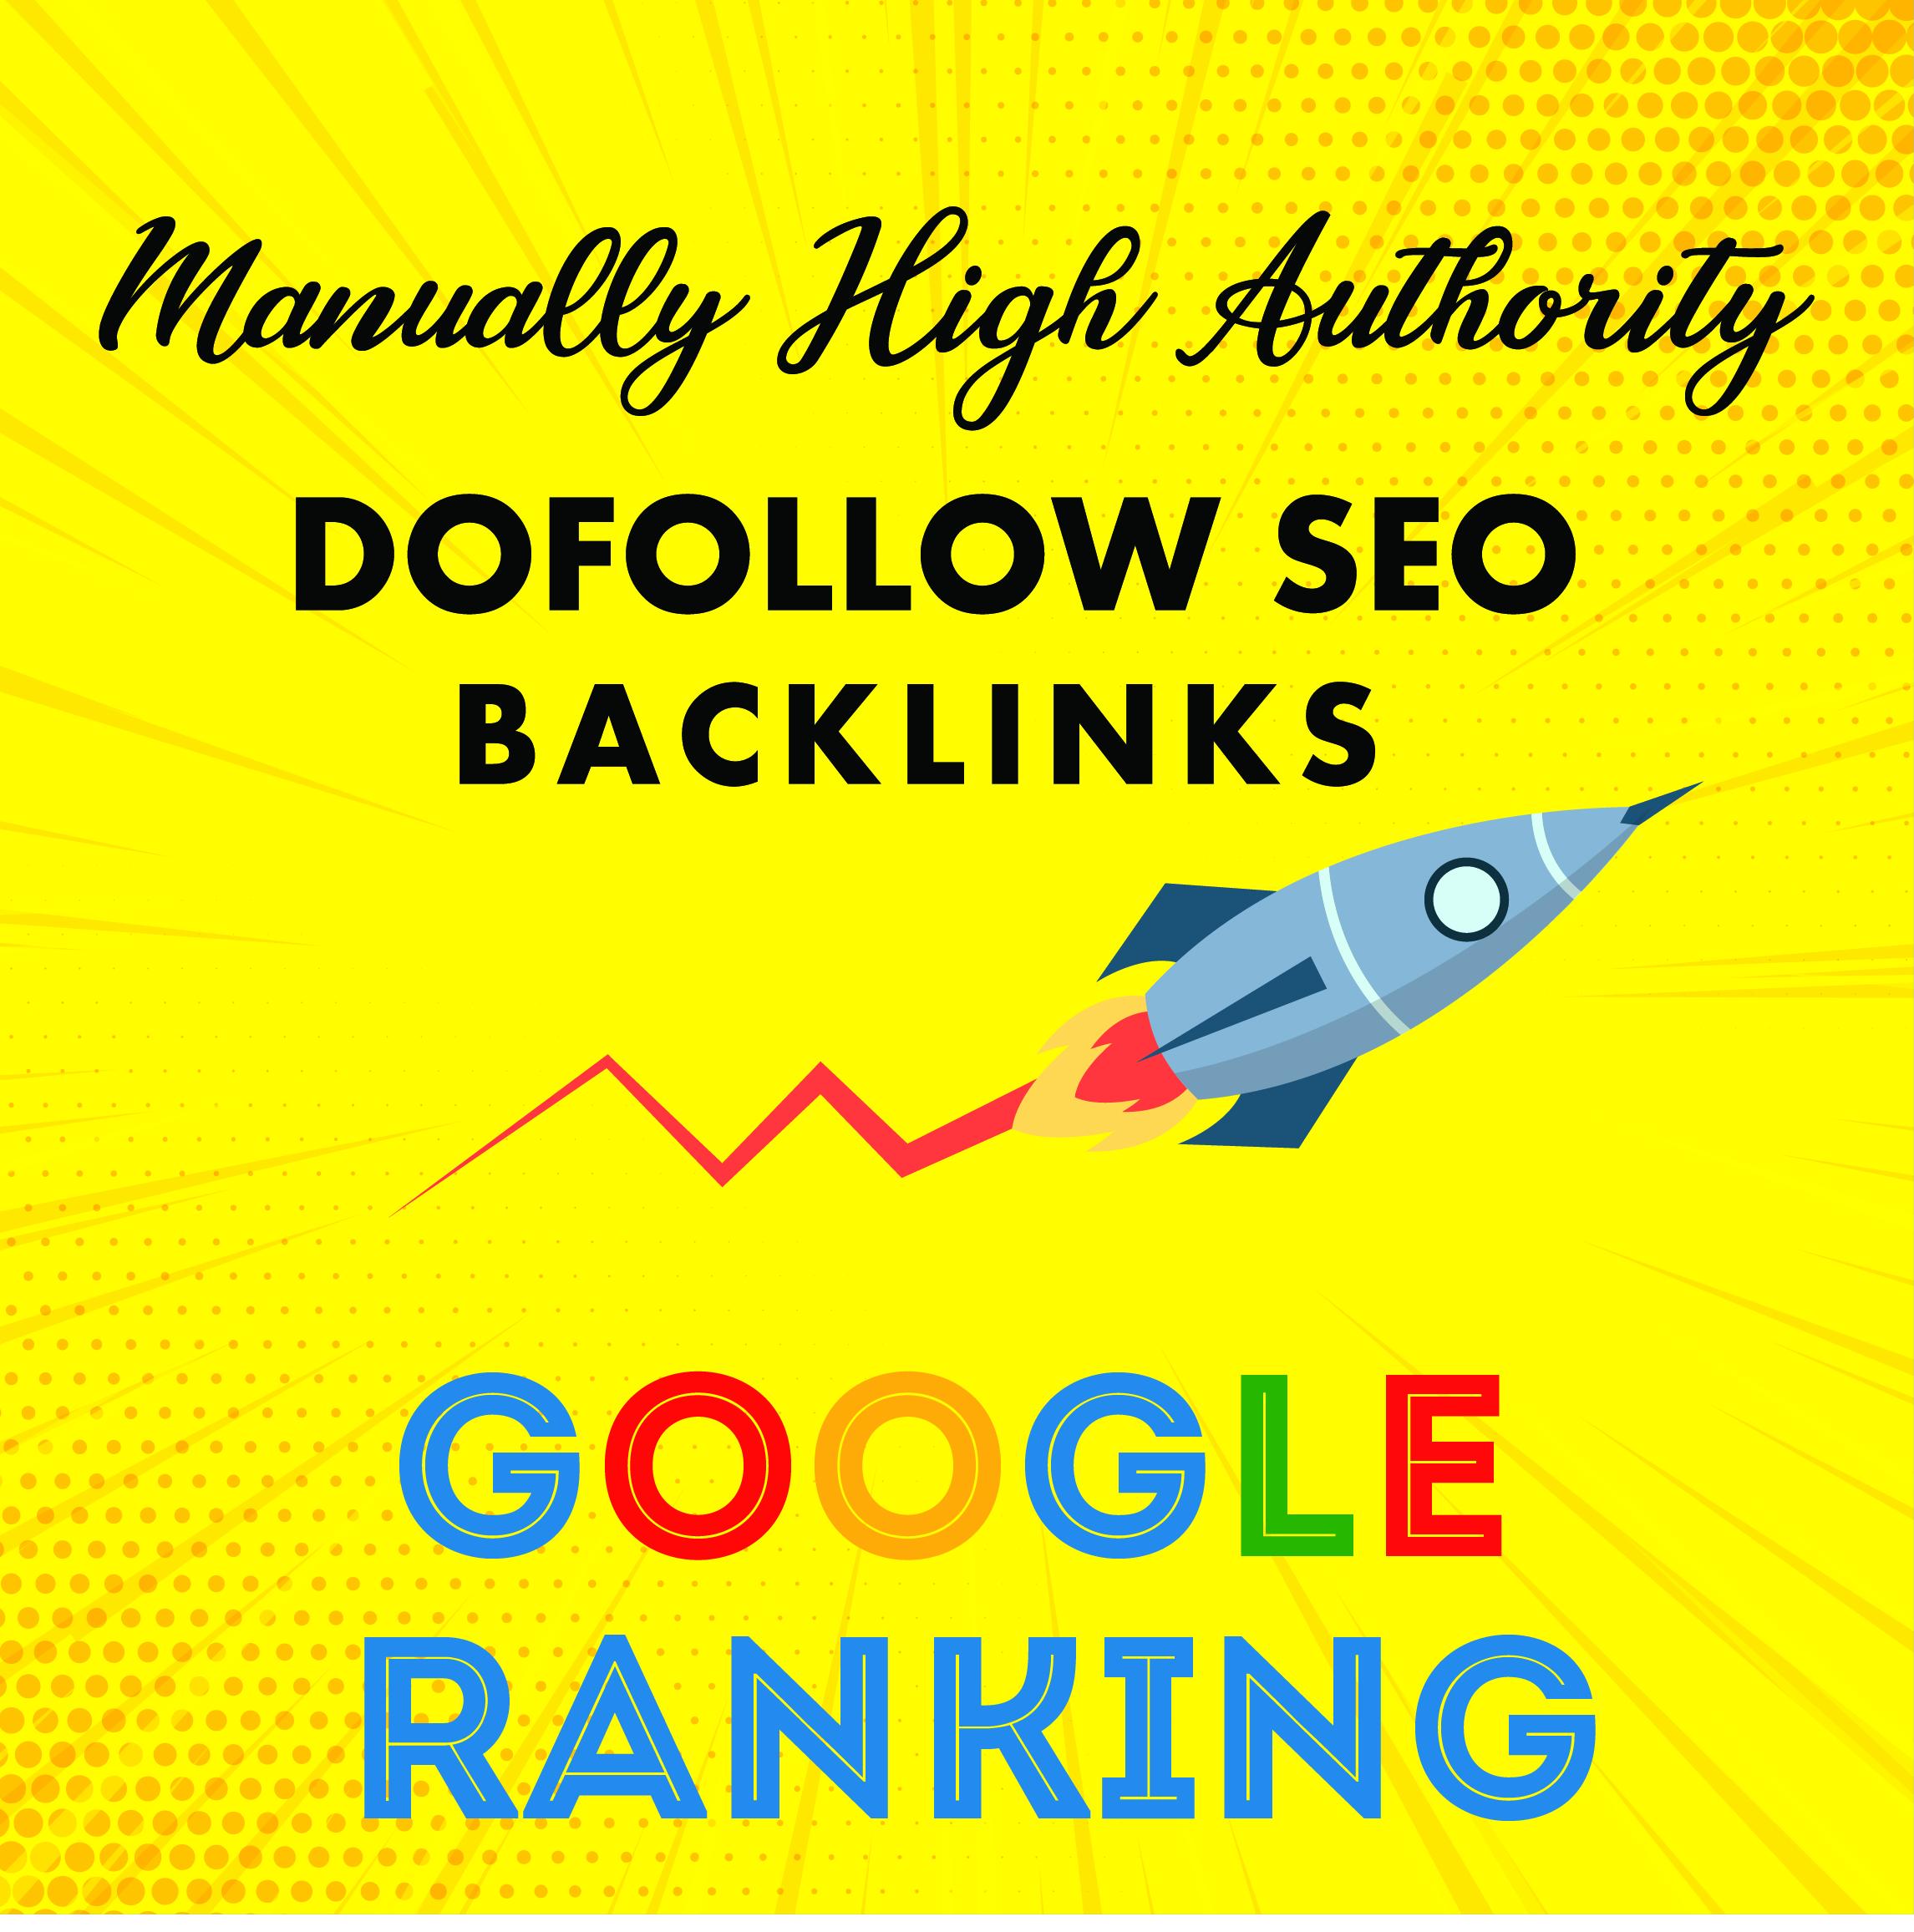 Skyrocket Your Google Ranking By Manually High Authority Dofollow SEO Backlinks